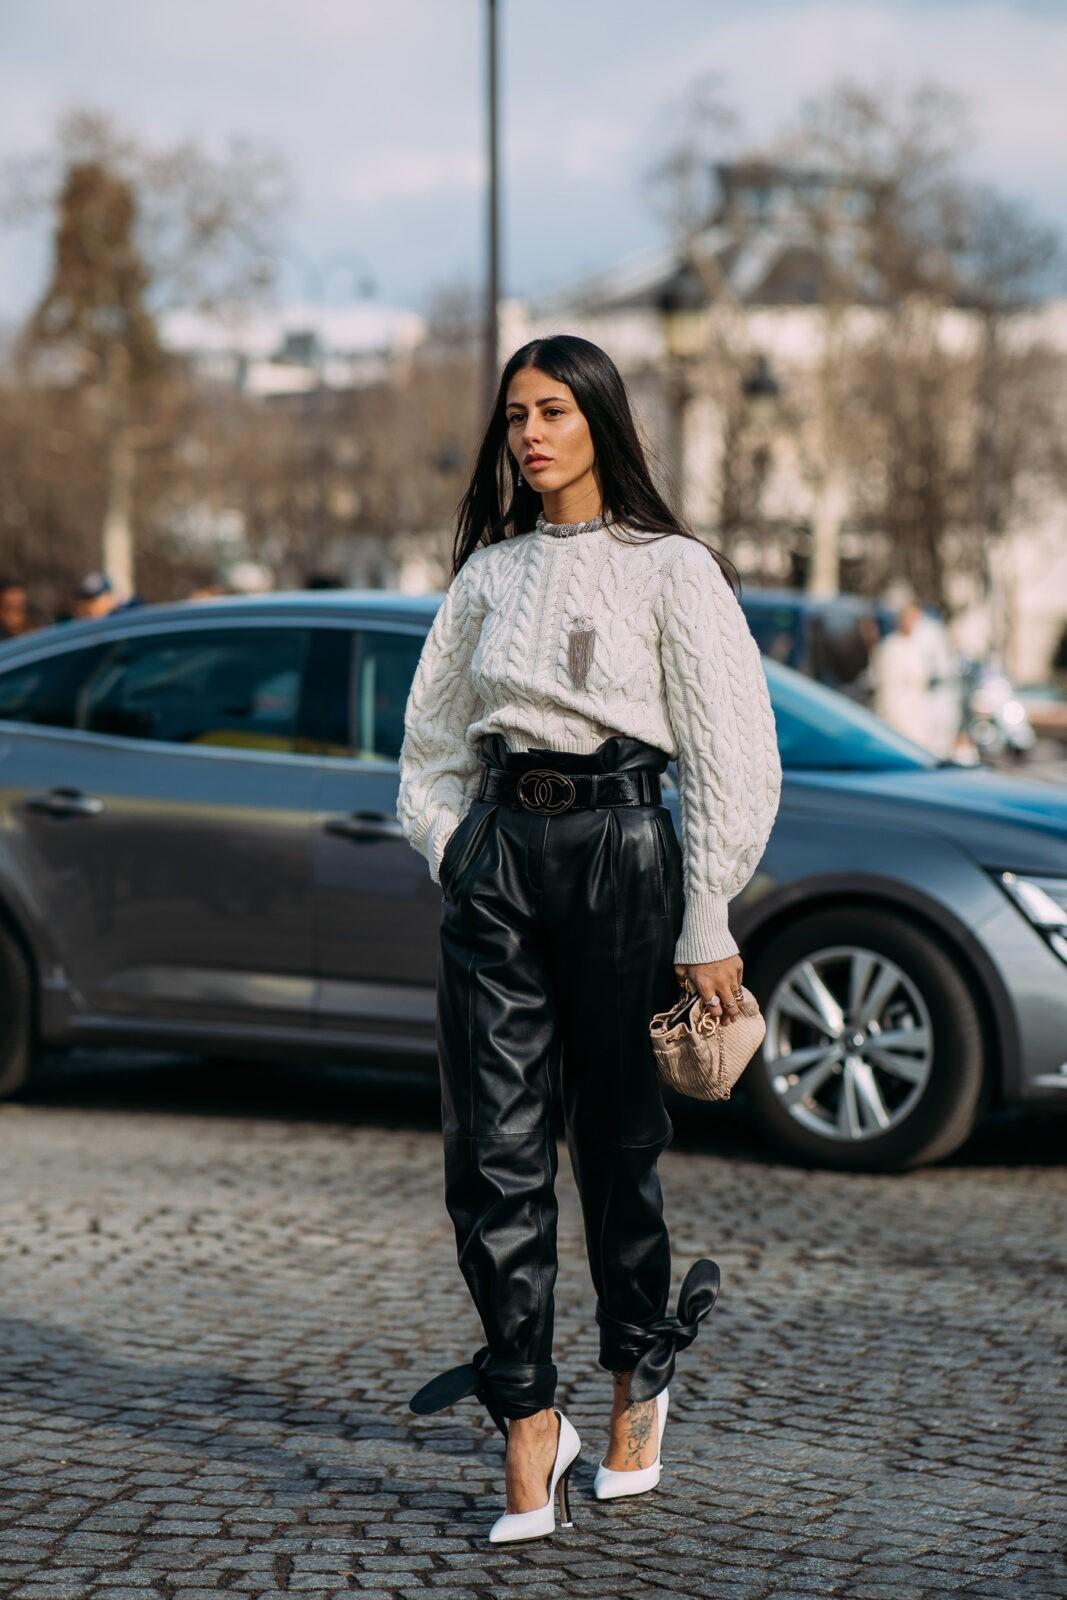 Gilda Ambrosio edit seven stylebook cable knit sweaters toronto